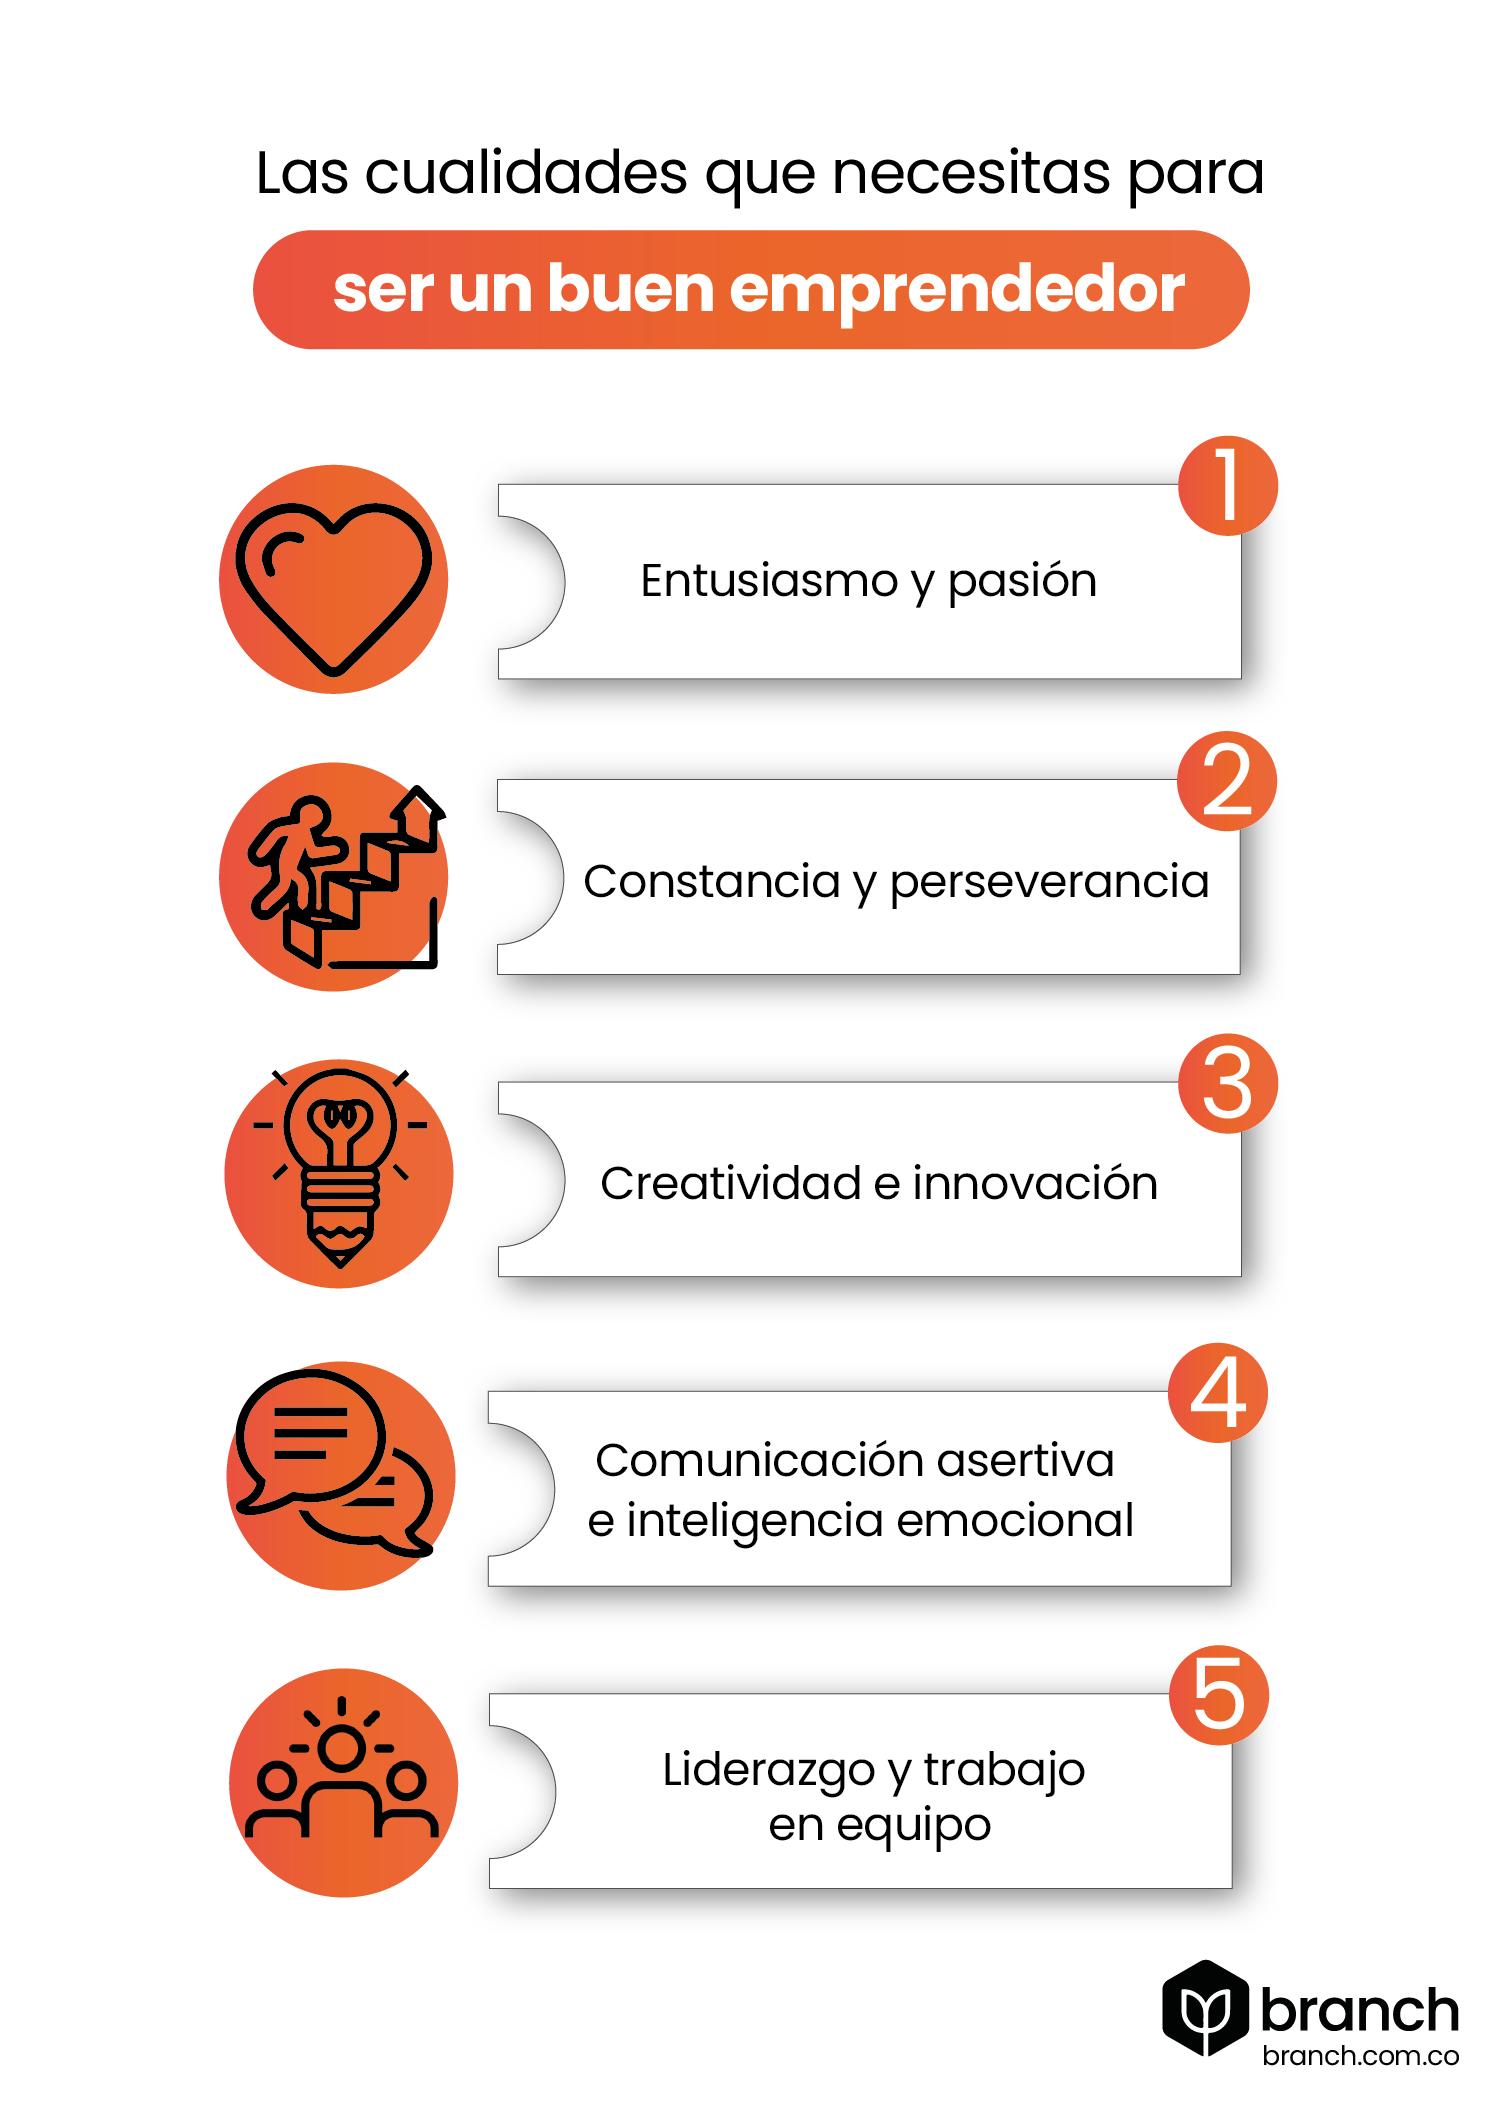 infografia-Las-cualidades-que-necesitas-para-ser-un-buen-emprendedor.